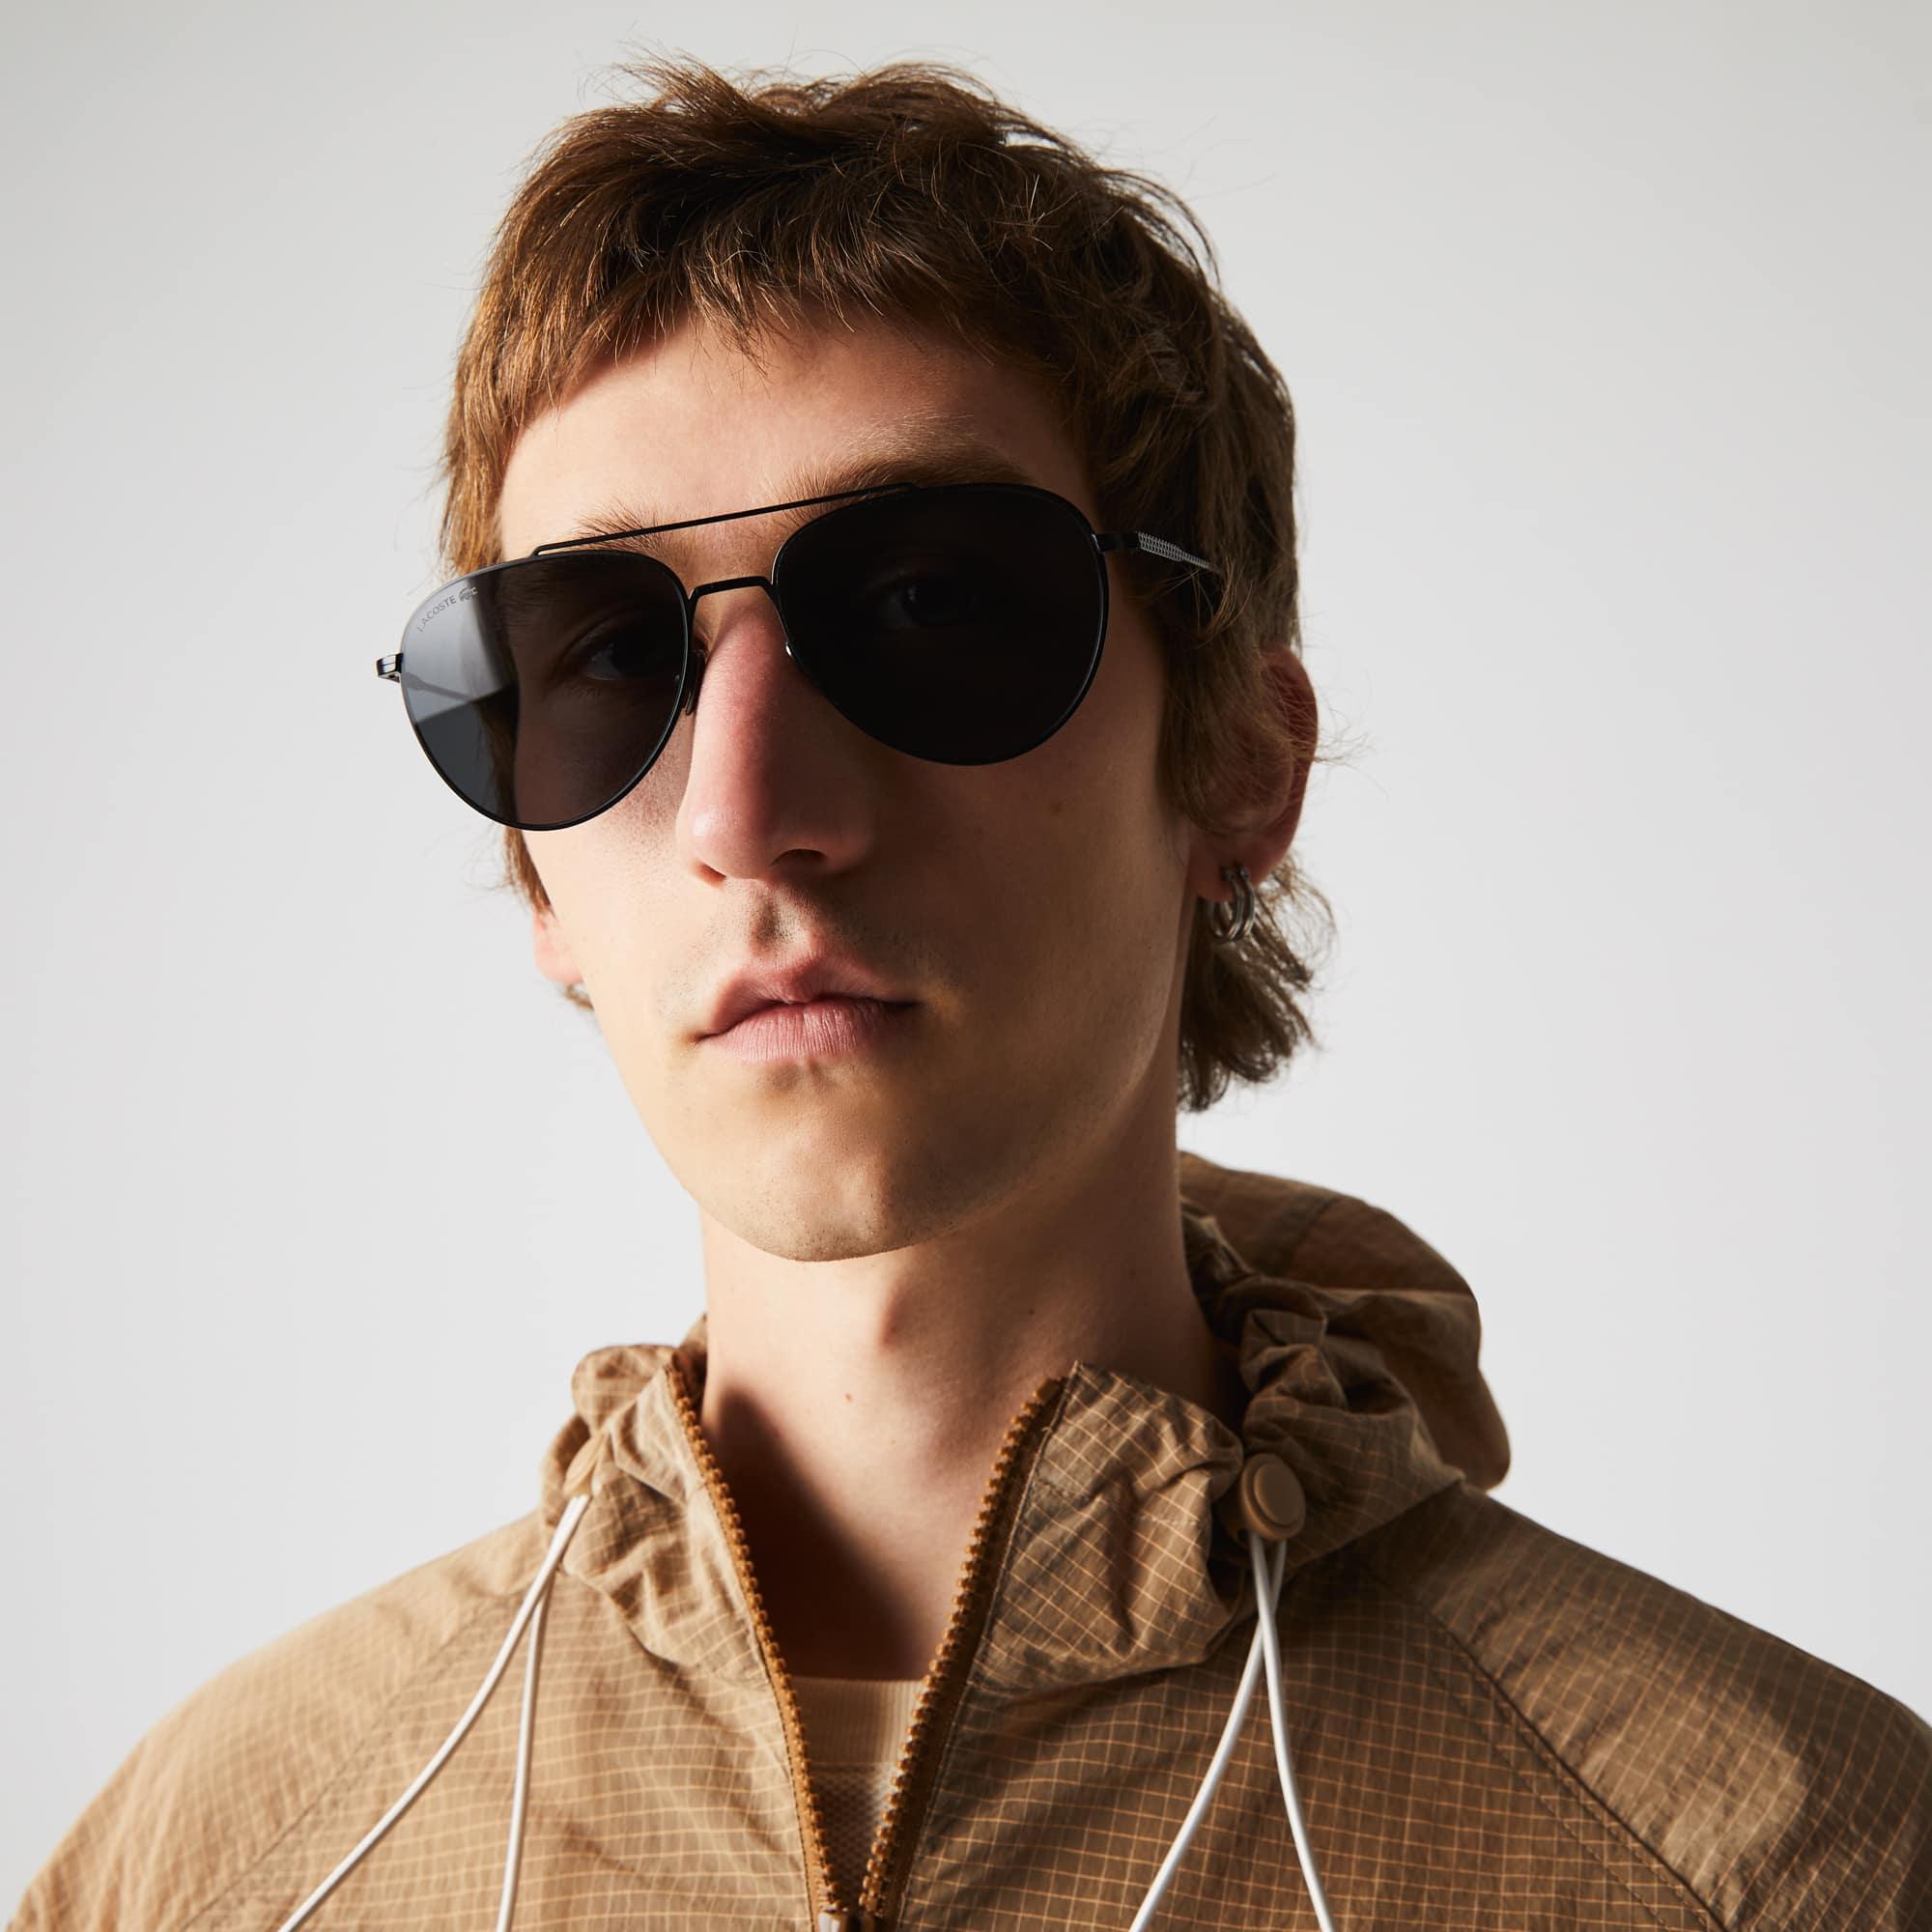 571d0acf752 Sunglasses for men